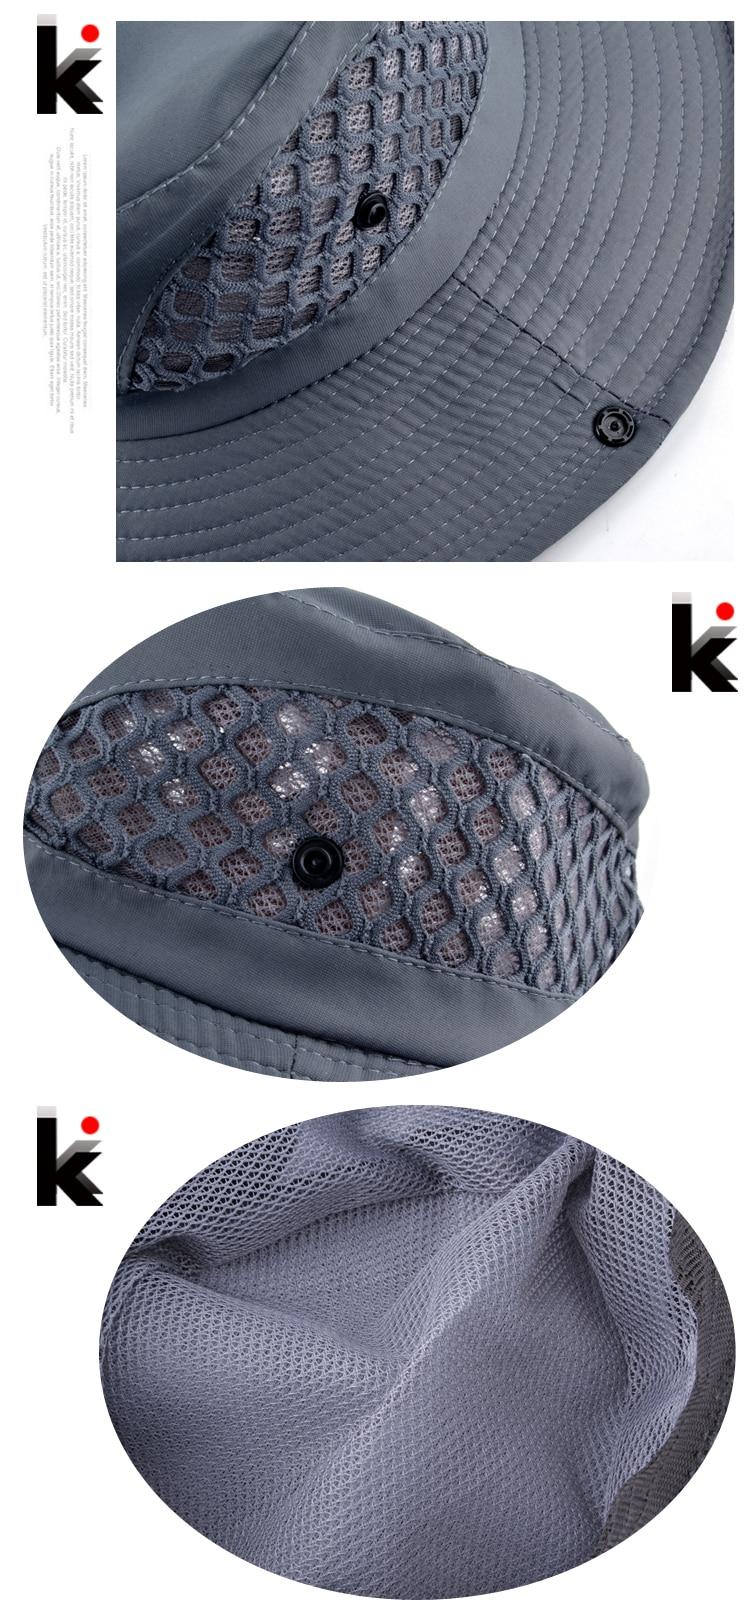 beach hat aeProduct.getSubject()